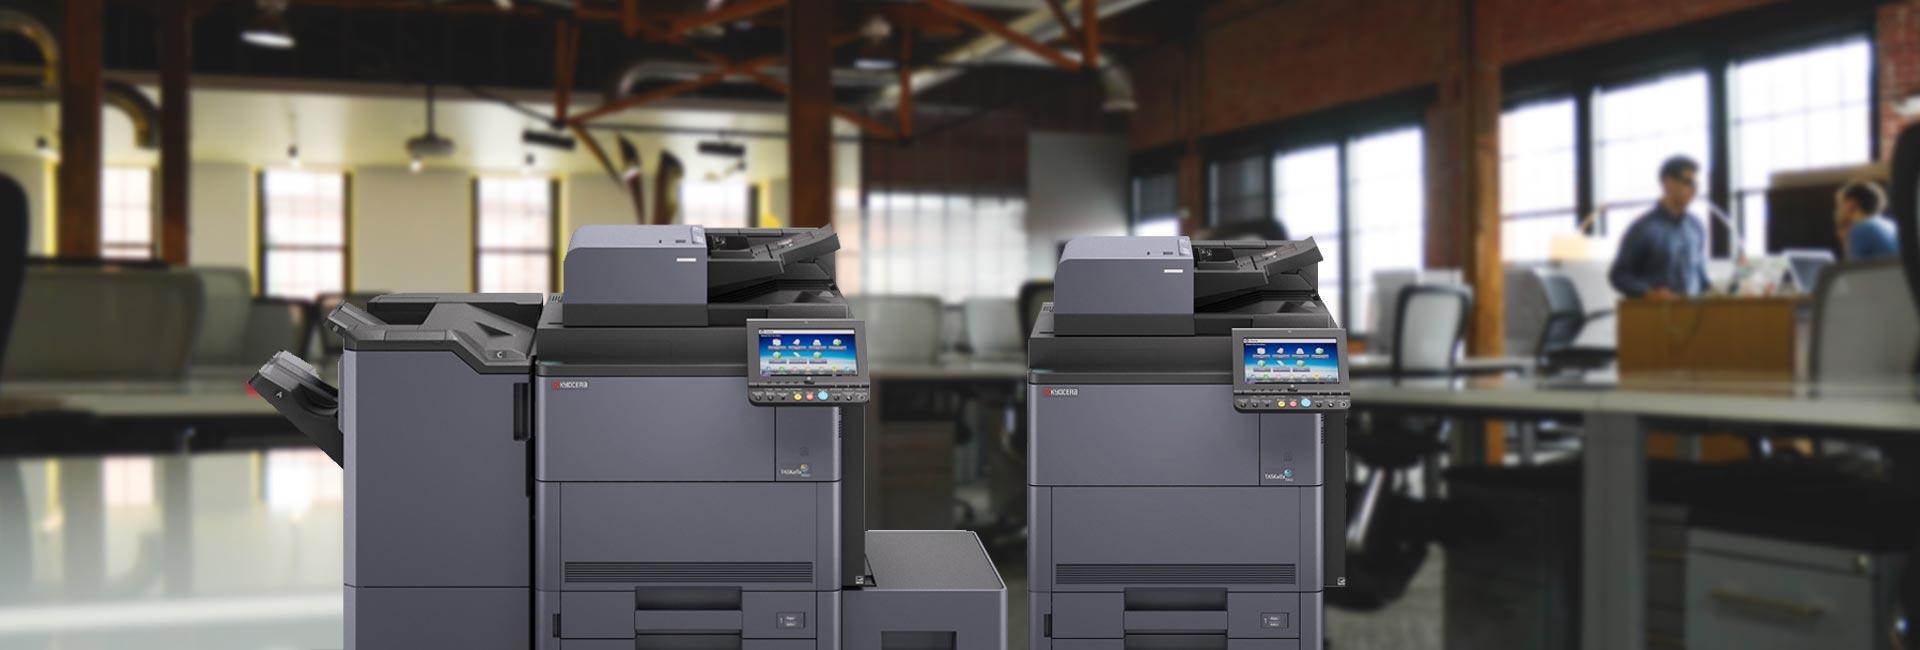 escritorio impressora